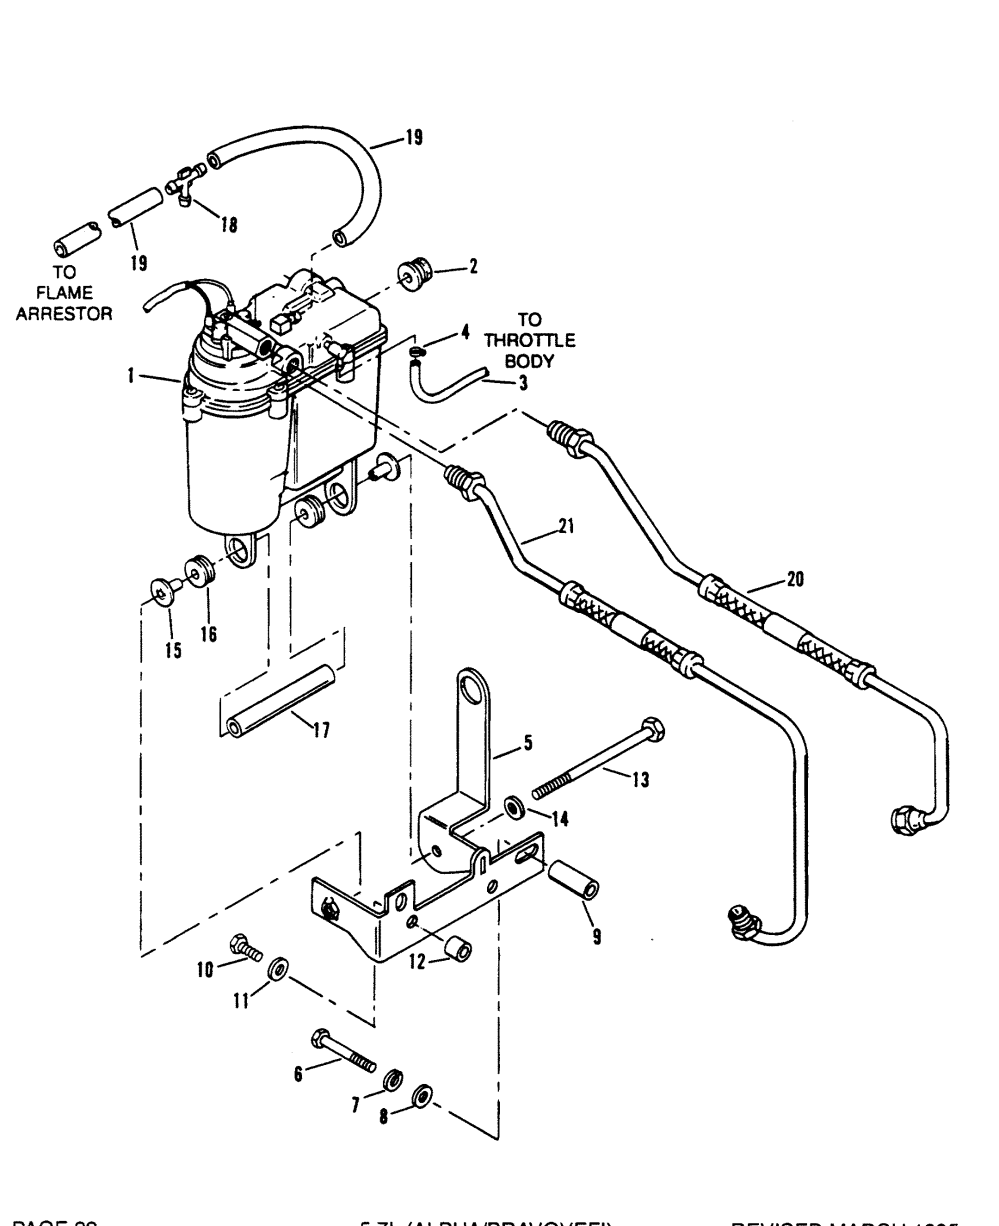 medium resolution of hardin marine vapor separator tank and fuel lines 1988 jeep cherokee fuel line diagram section drawing